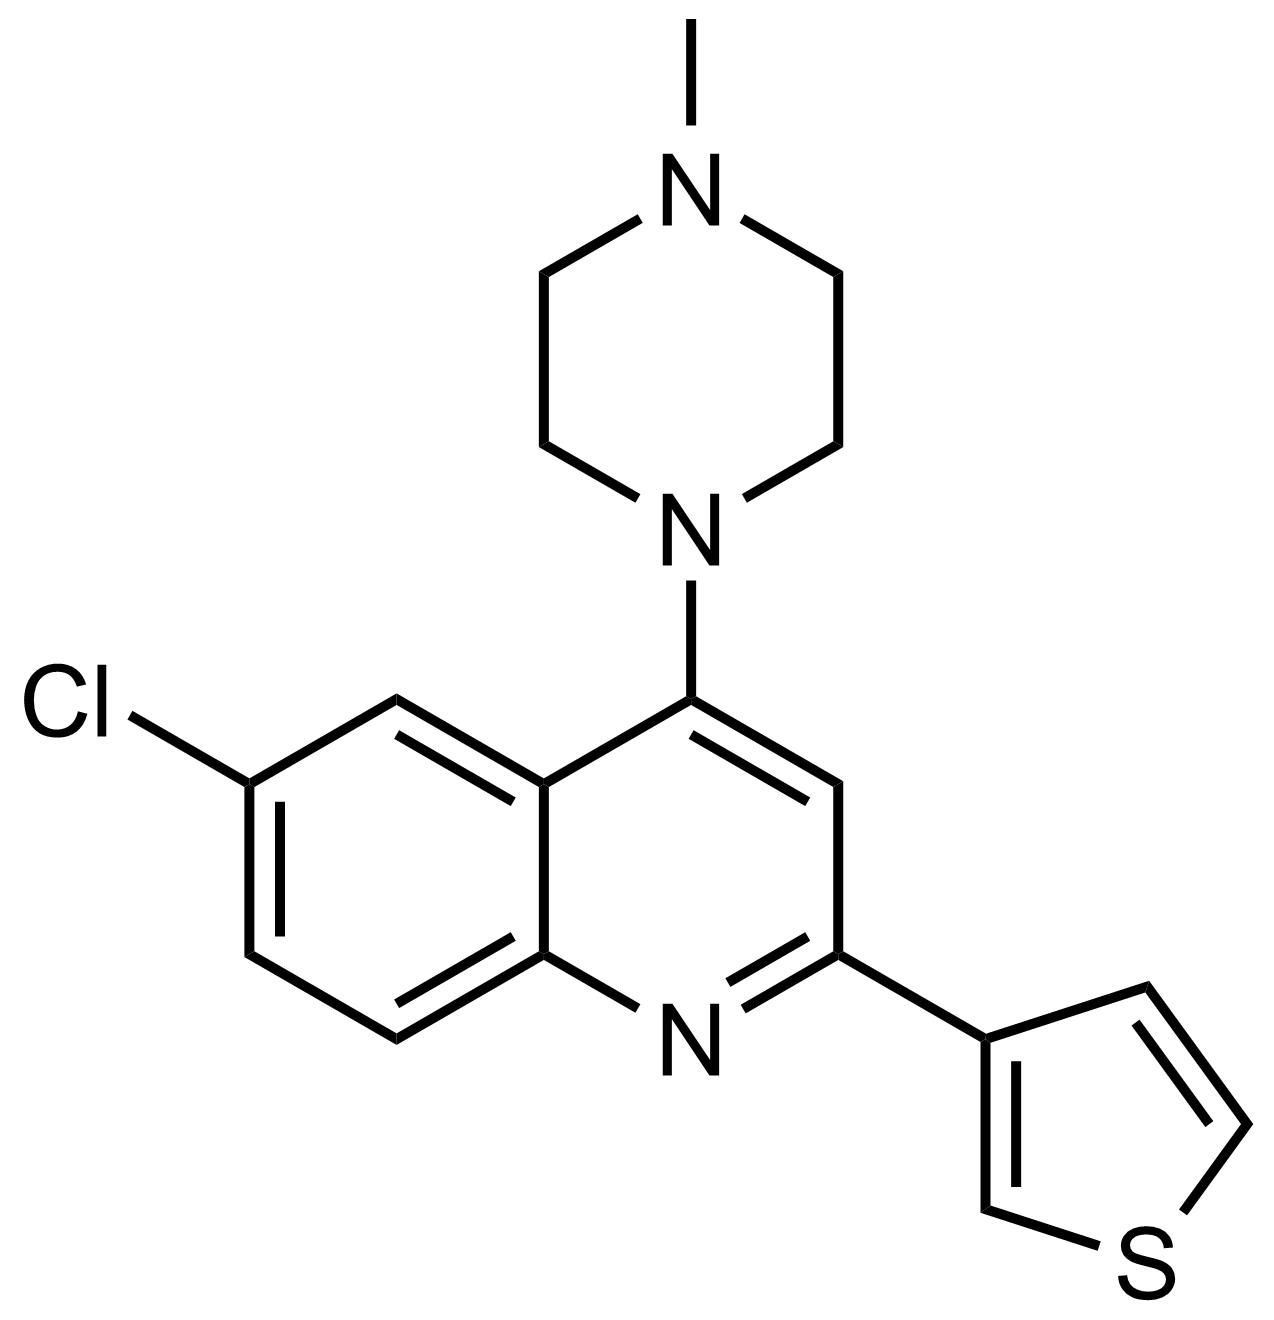 Structure of 6-Chloro-4-(4-methylpiperazin-1-yl)-2-(thiophen-3-yl)quinoline